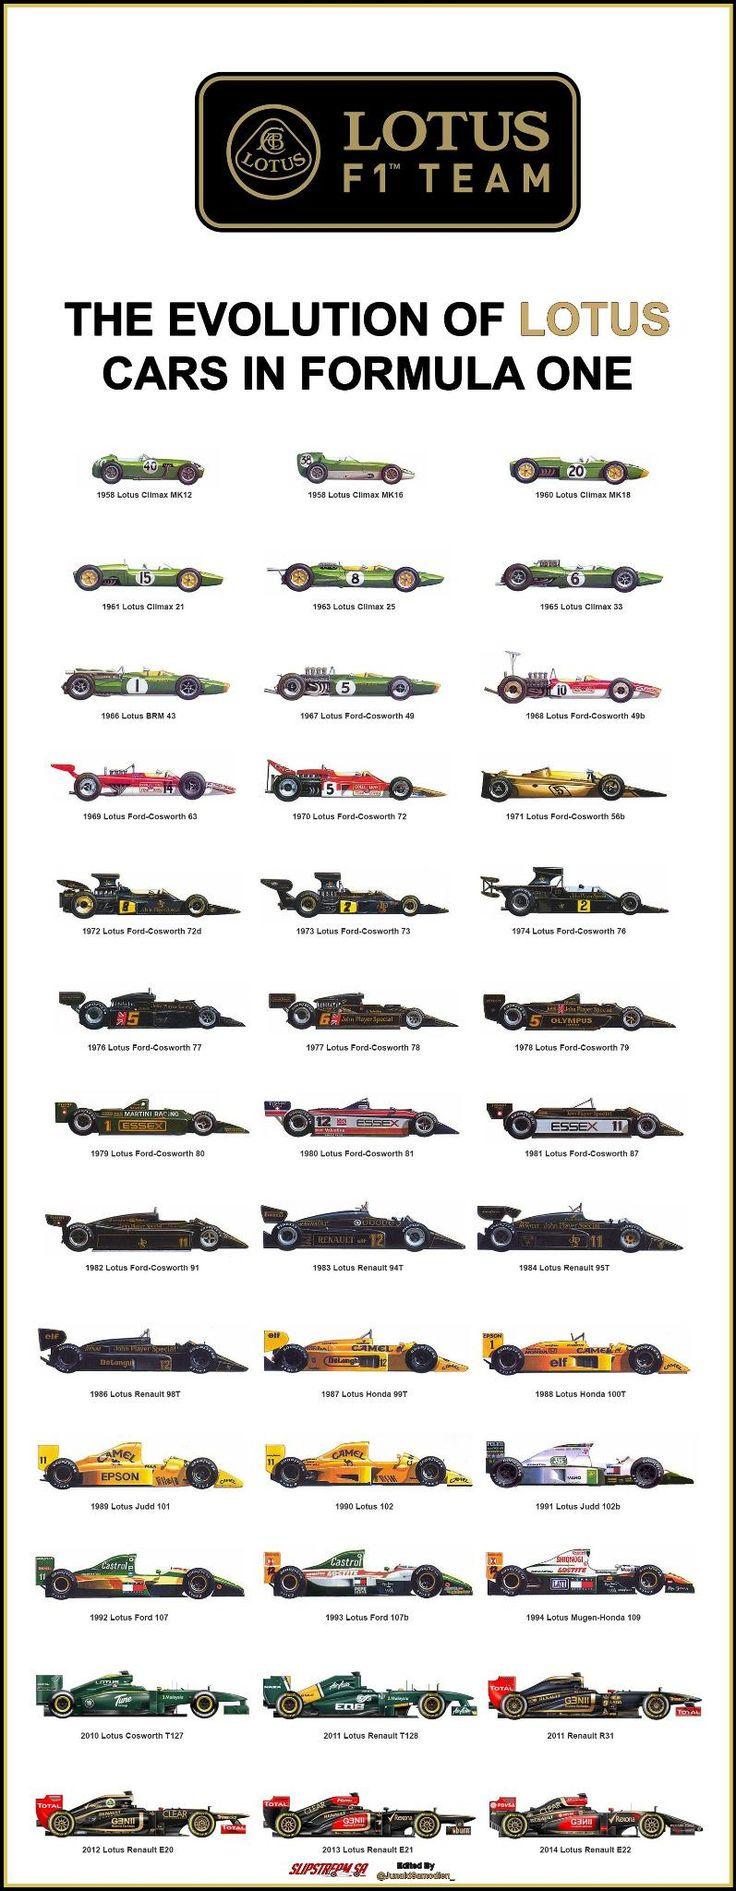 The Evolution of @Lotus_F1Team cars in Formula One - @ClassicFormula1